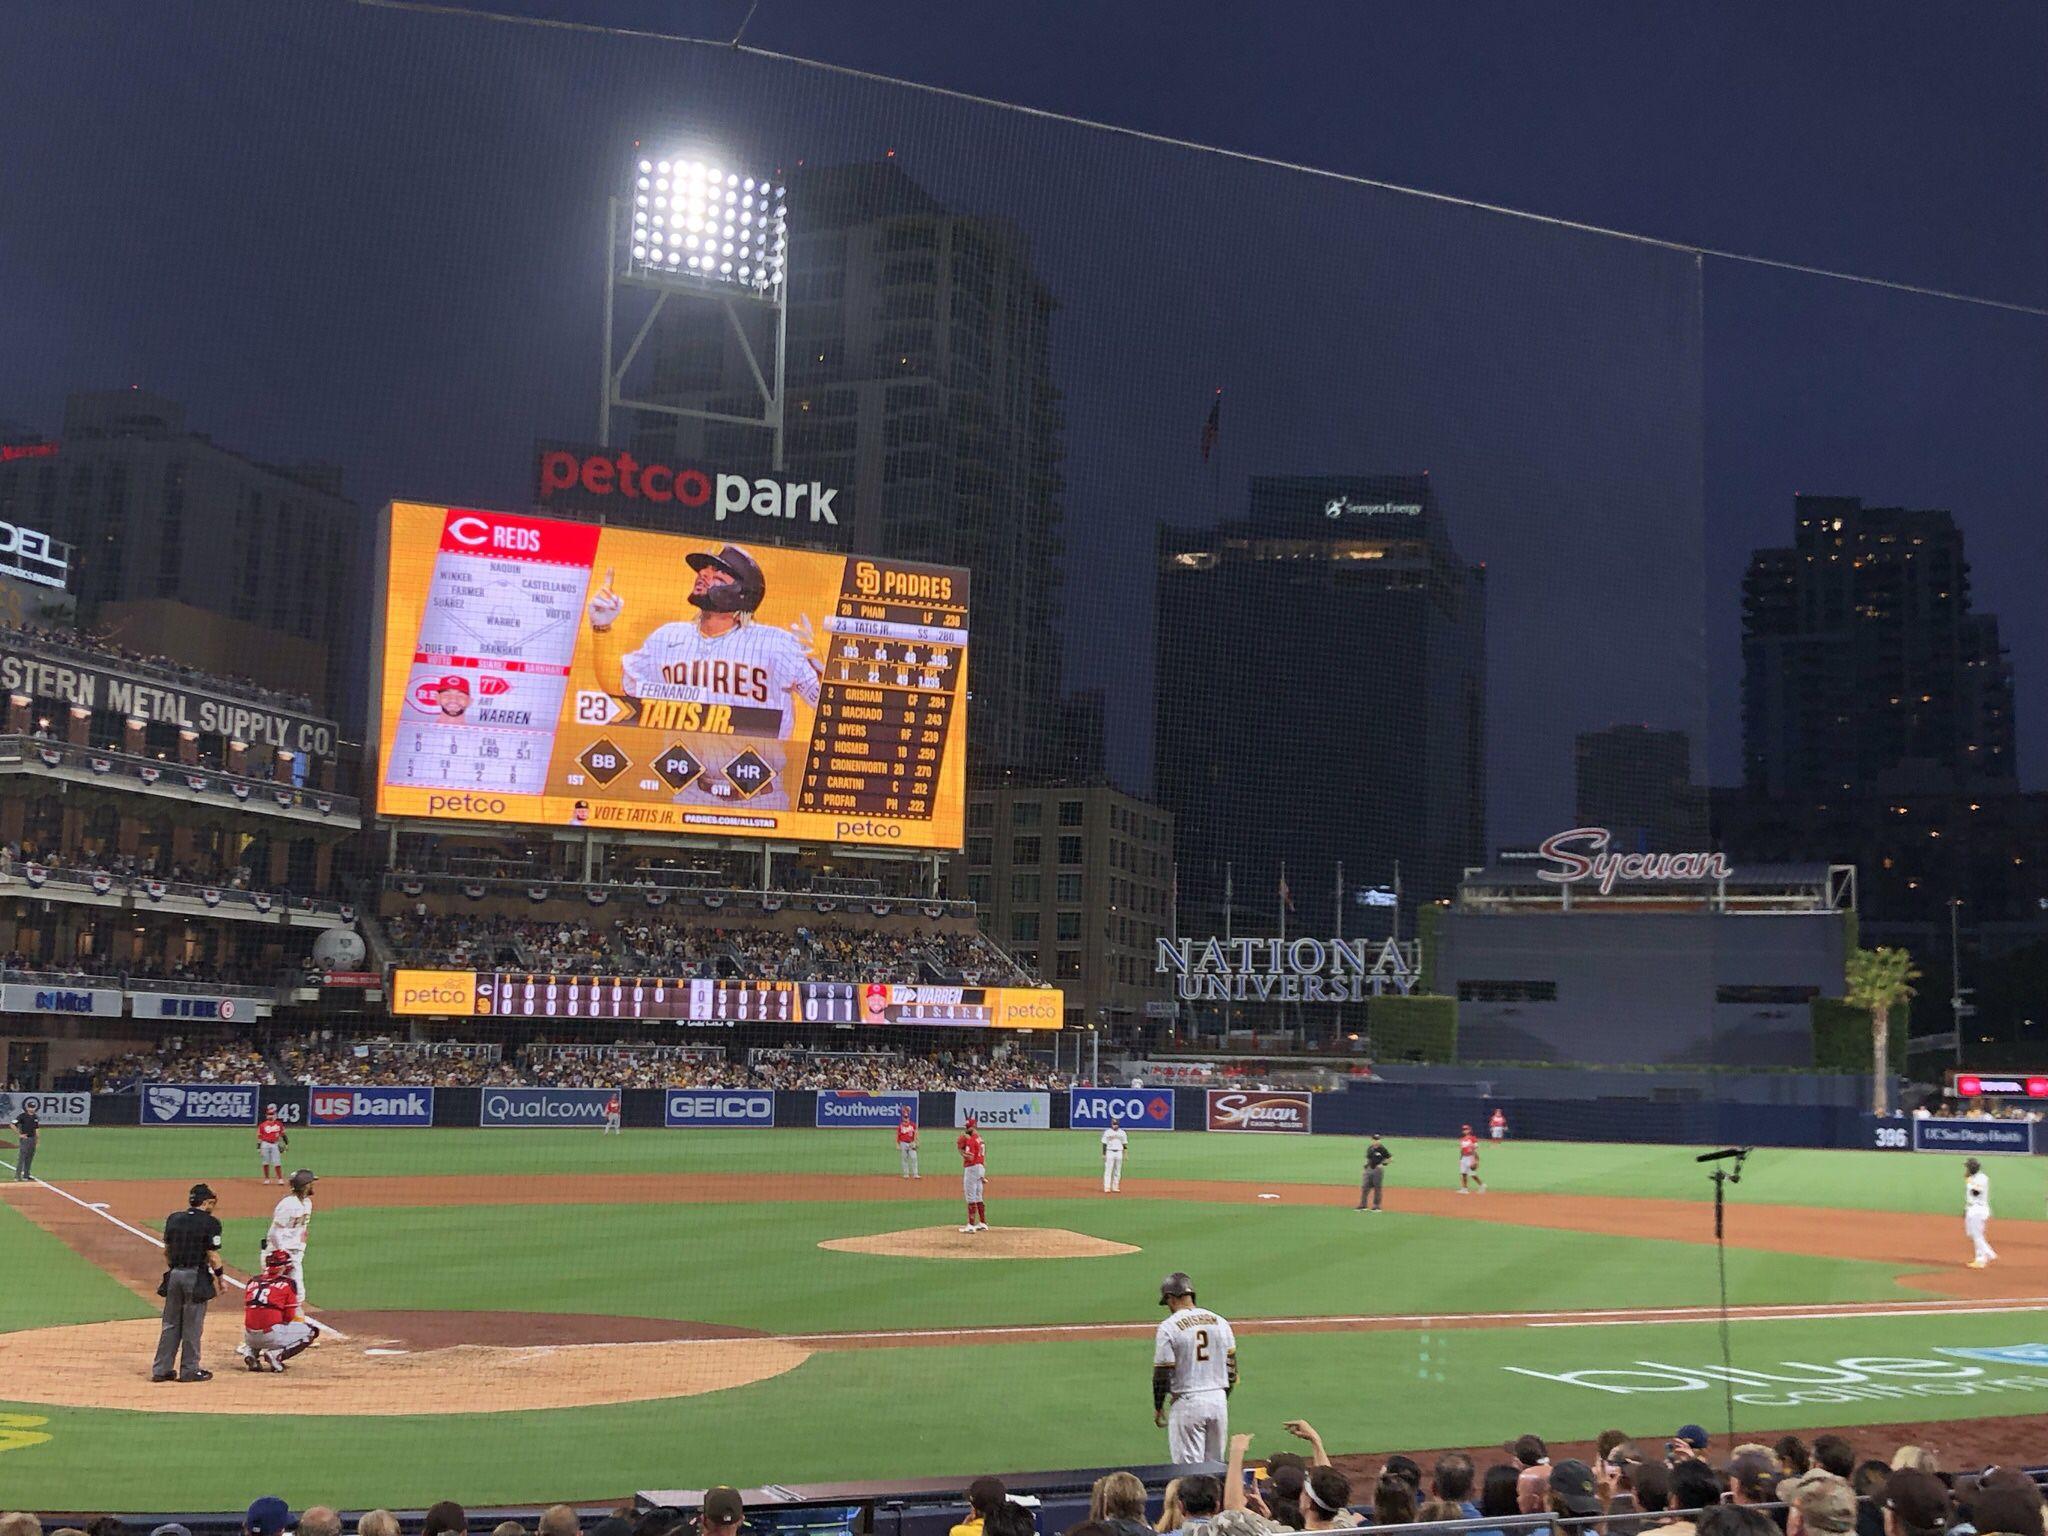 Padres Field Box VIP 103, Tickets vs Giants, Braves